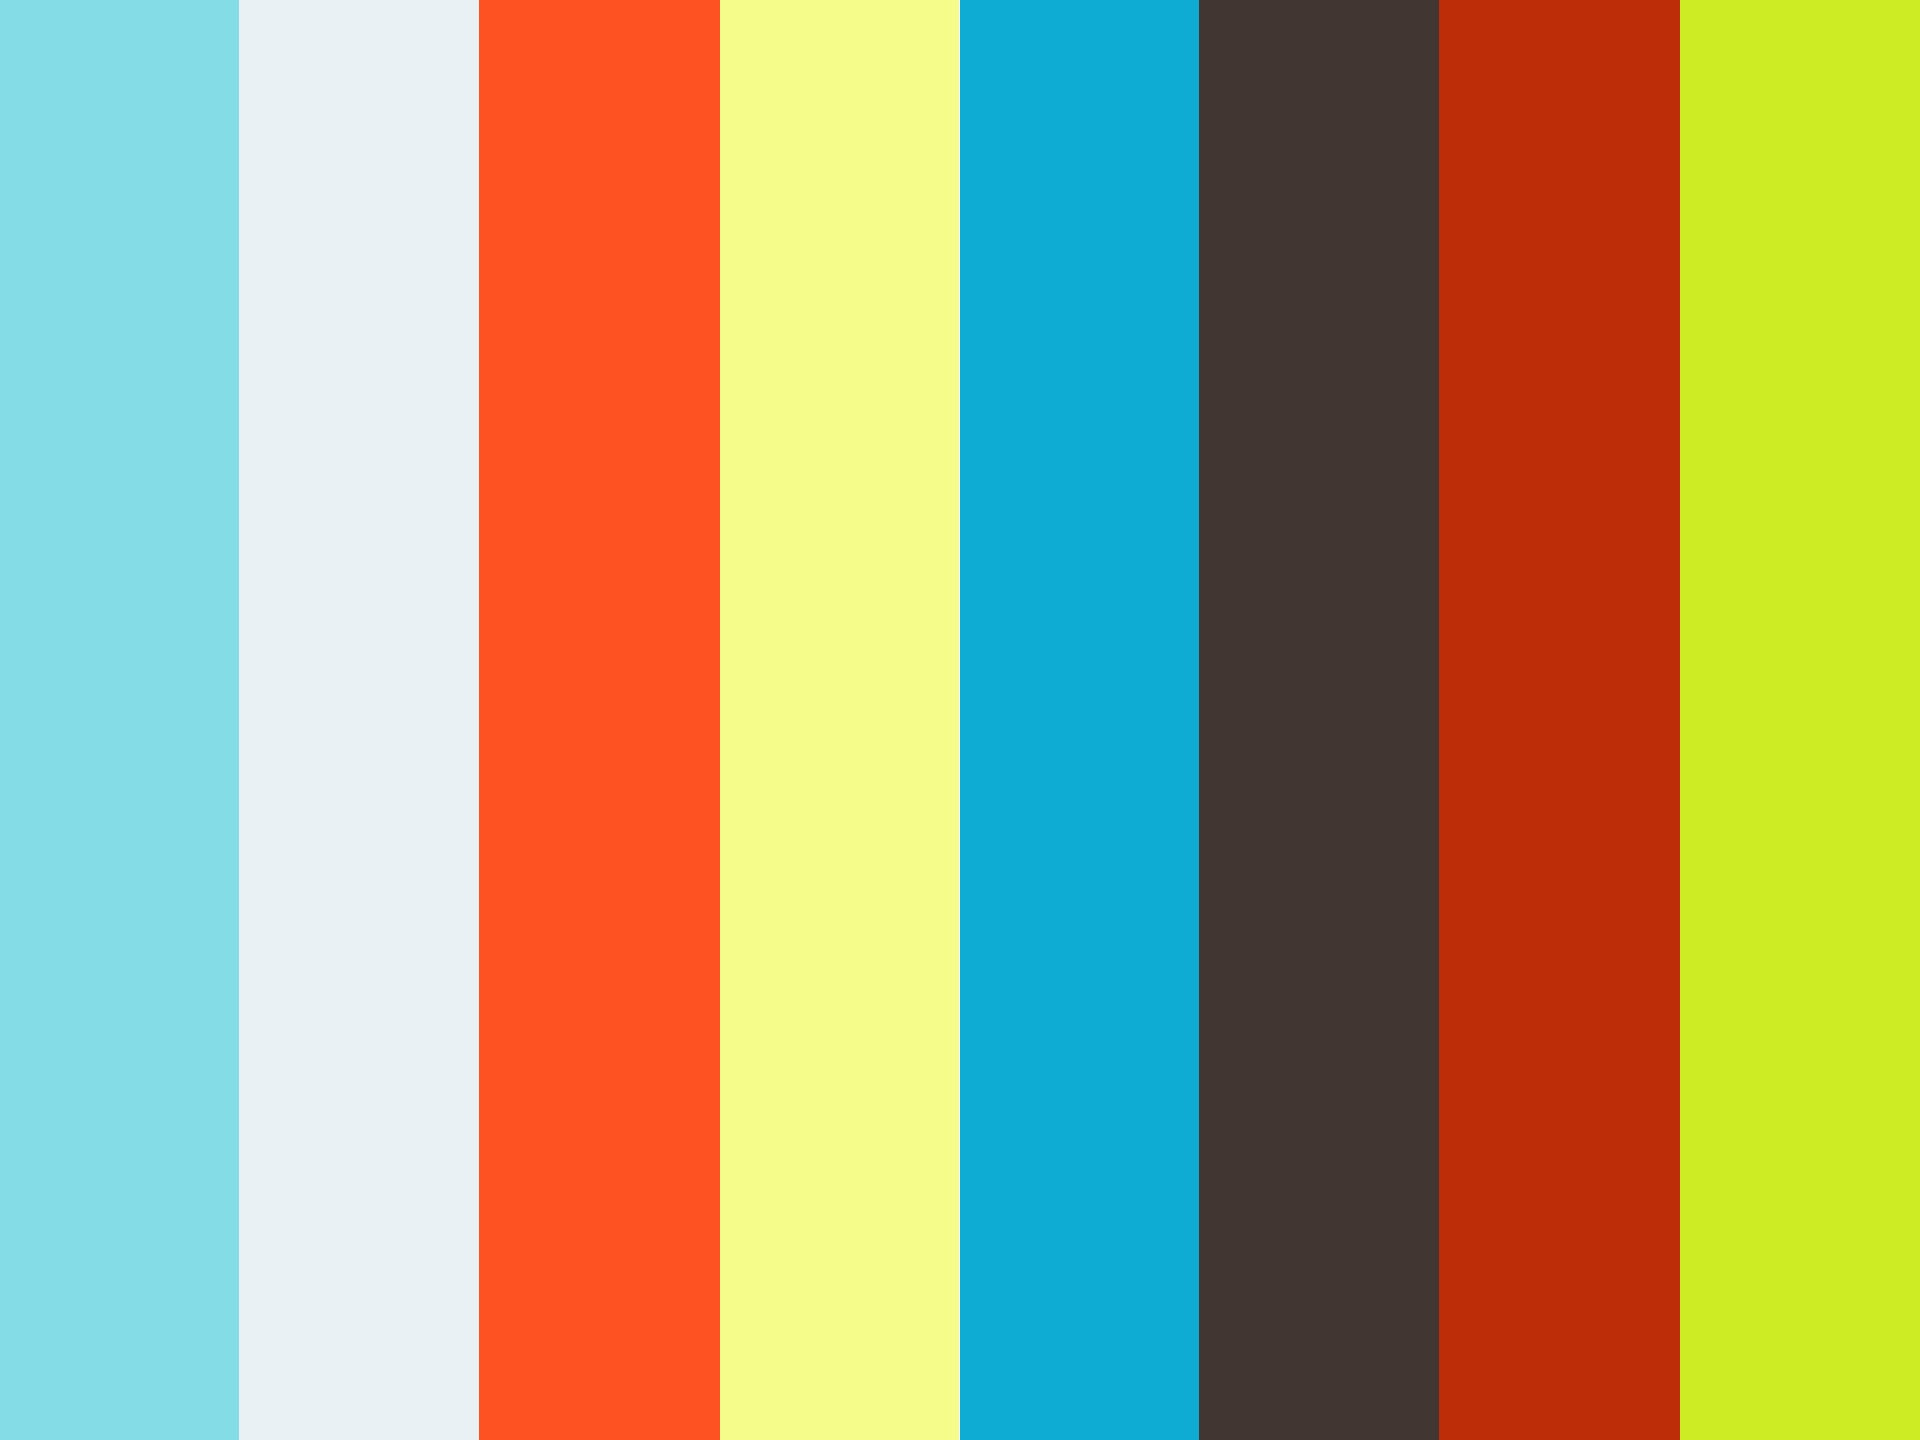 serif graphic design software